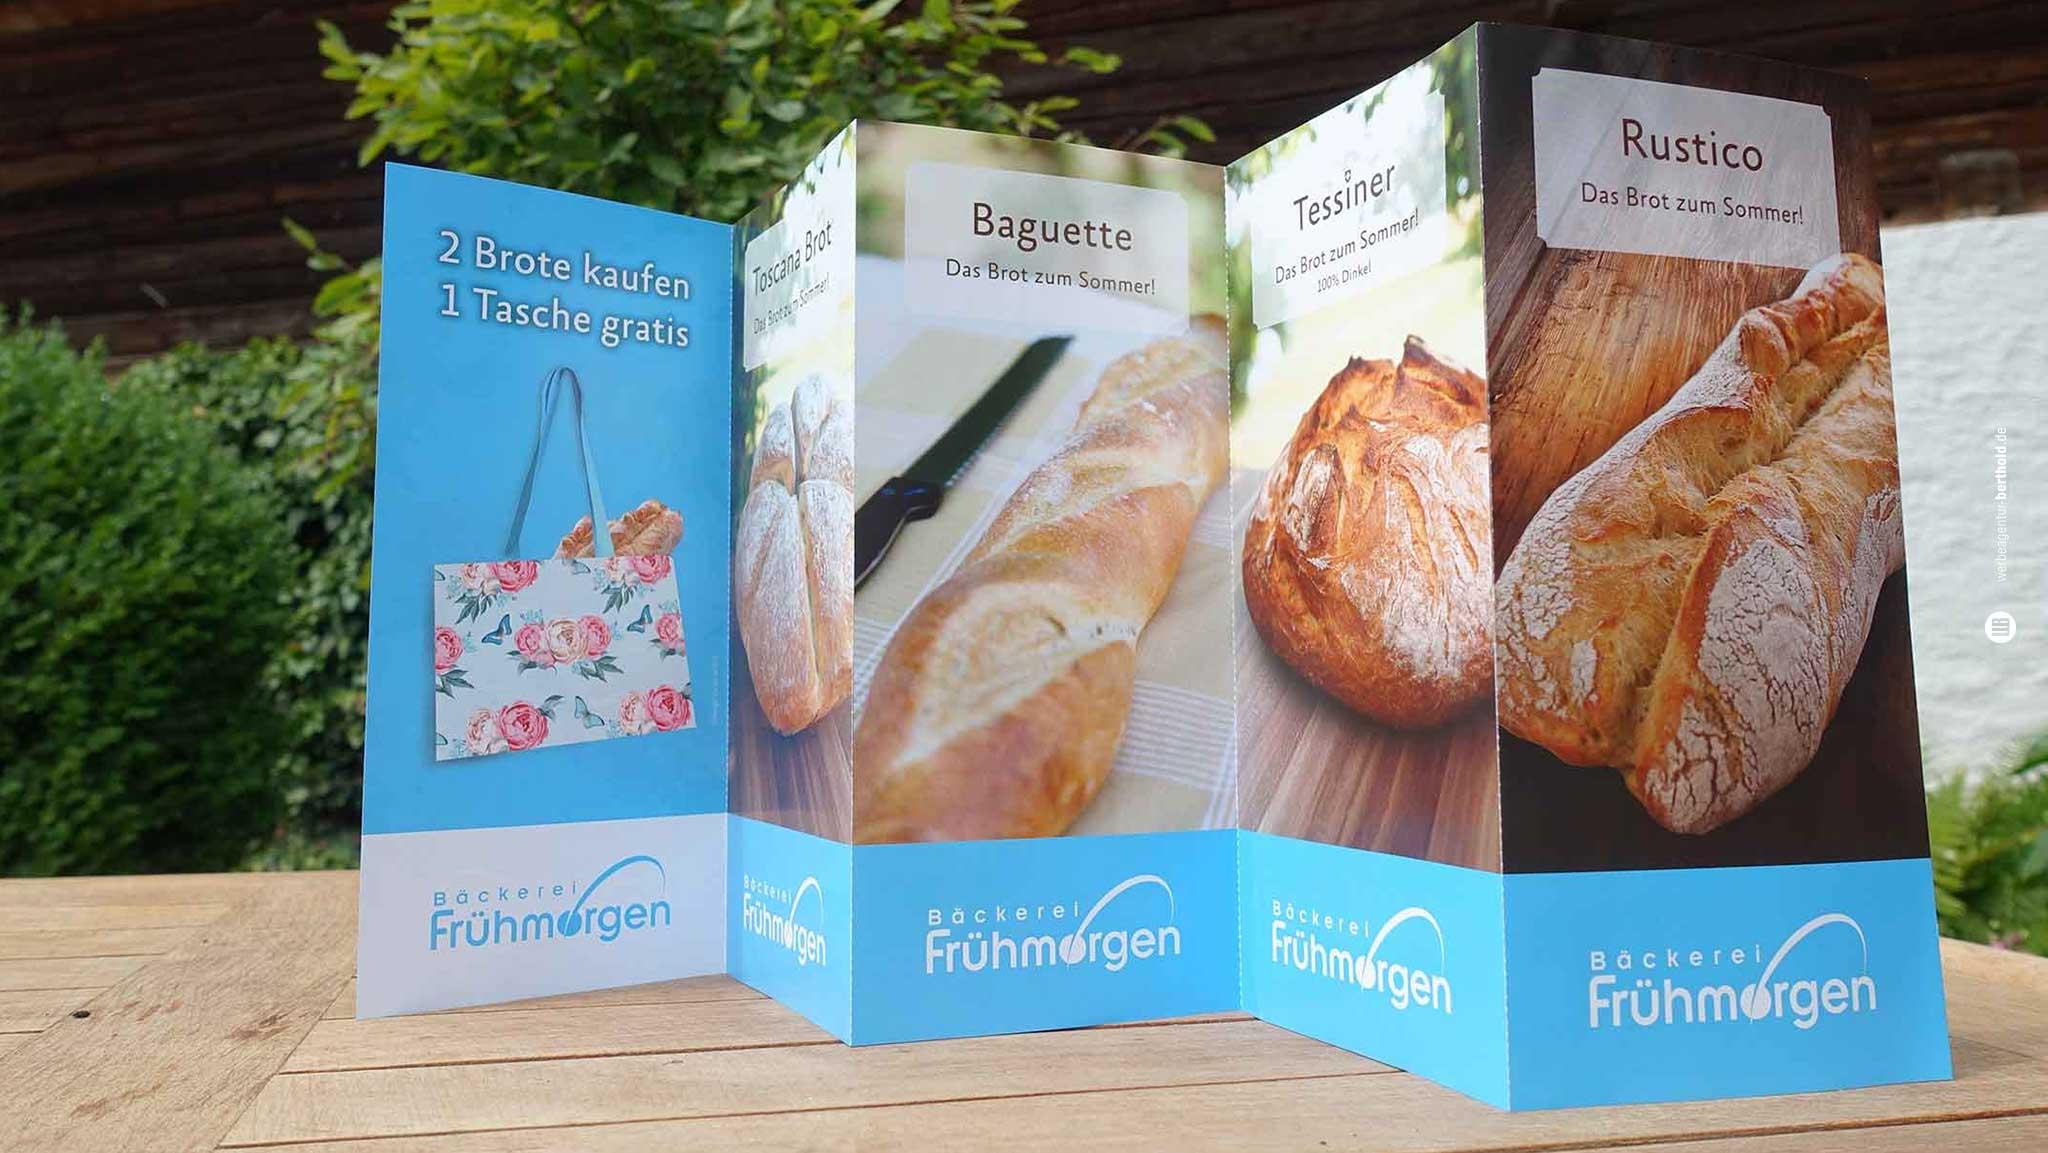 Bäckerei Frühmorgen, Postwurfsendung